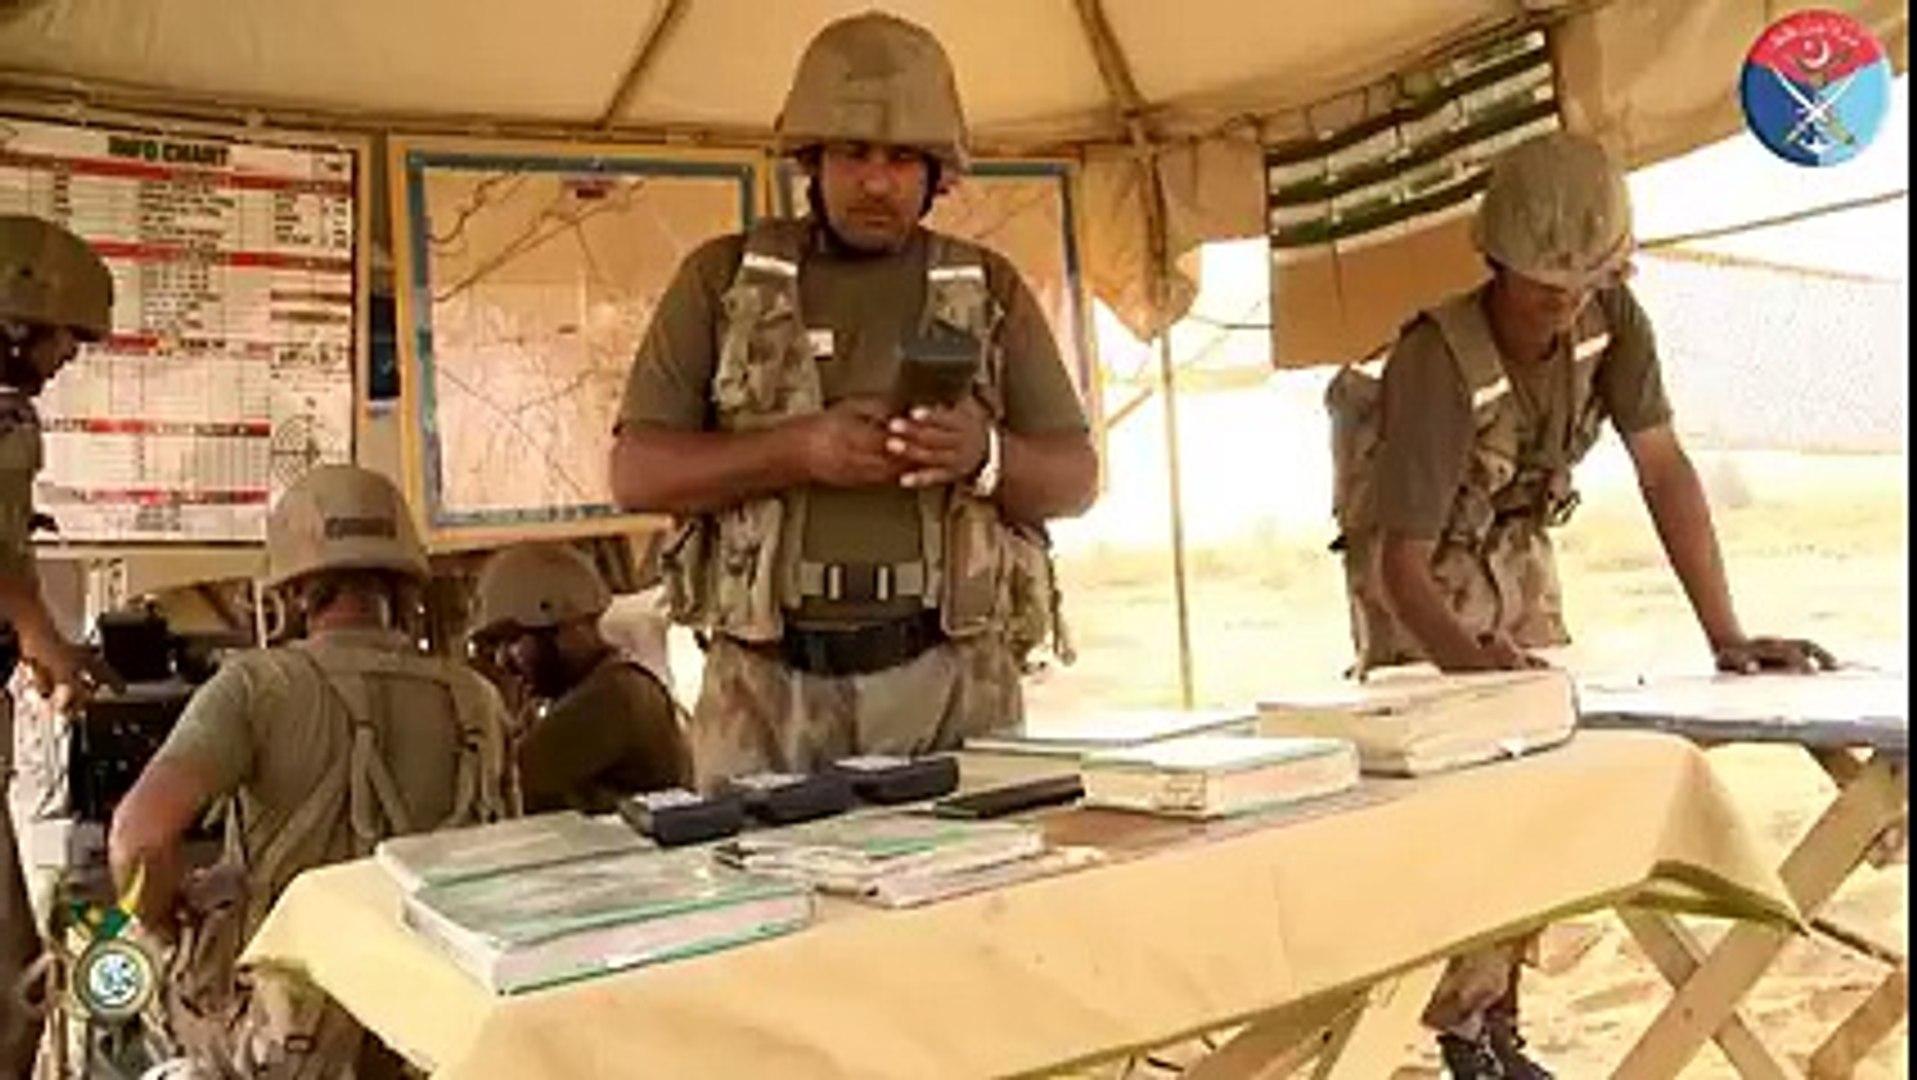 Tributes to Pak Army 2015 | Latest Release by ISPR 2015 | Jab Naam Pukaray  Jayen Ge Sab Ahle Wafa K - Urdu Patriot Song 2015